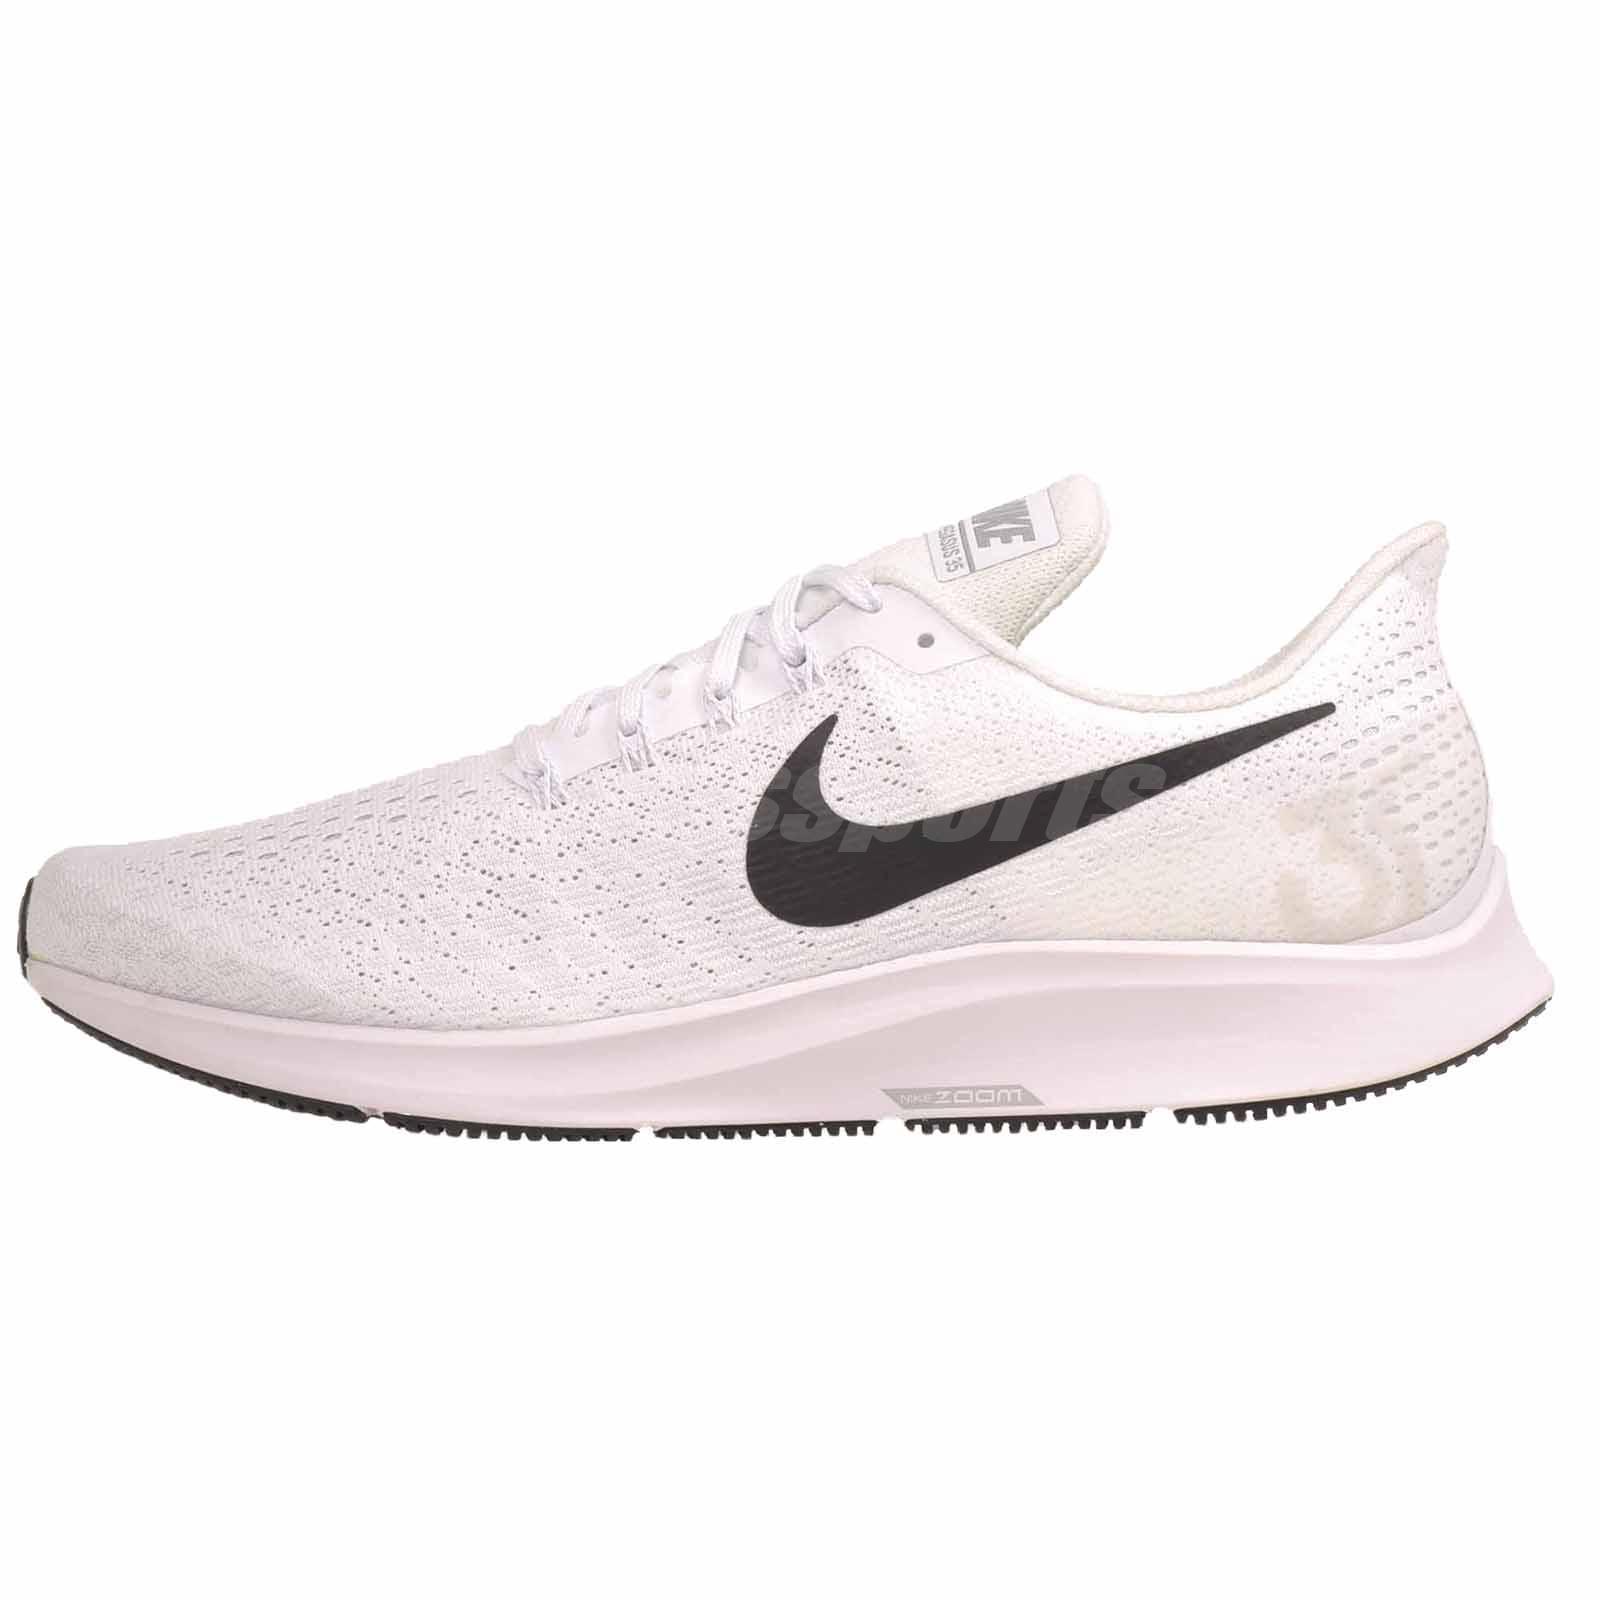 Nike Air Zoom Pegasus 35 TB Running